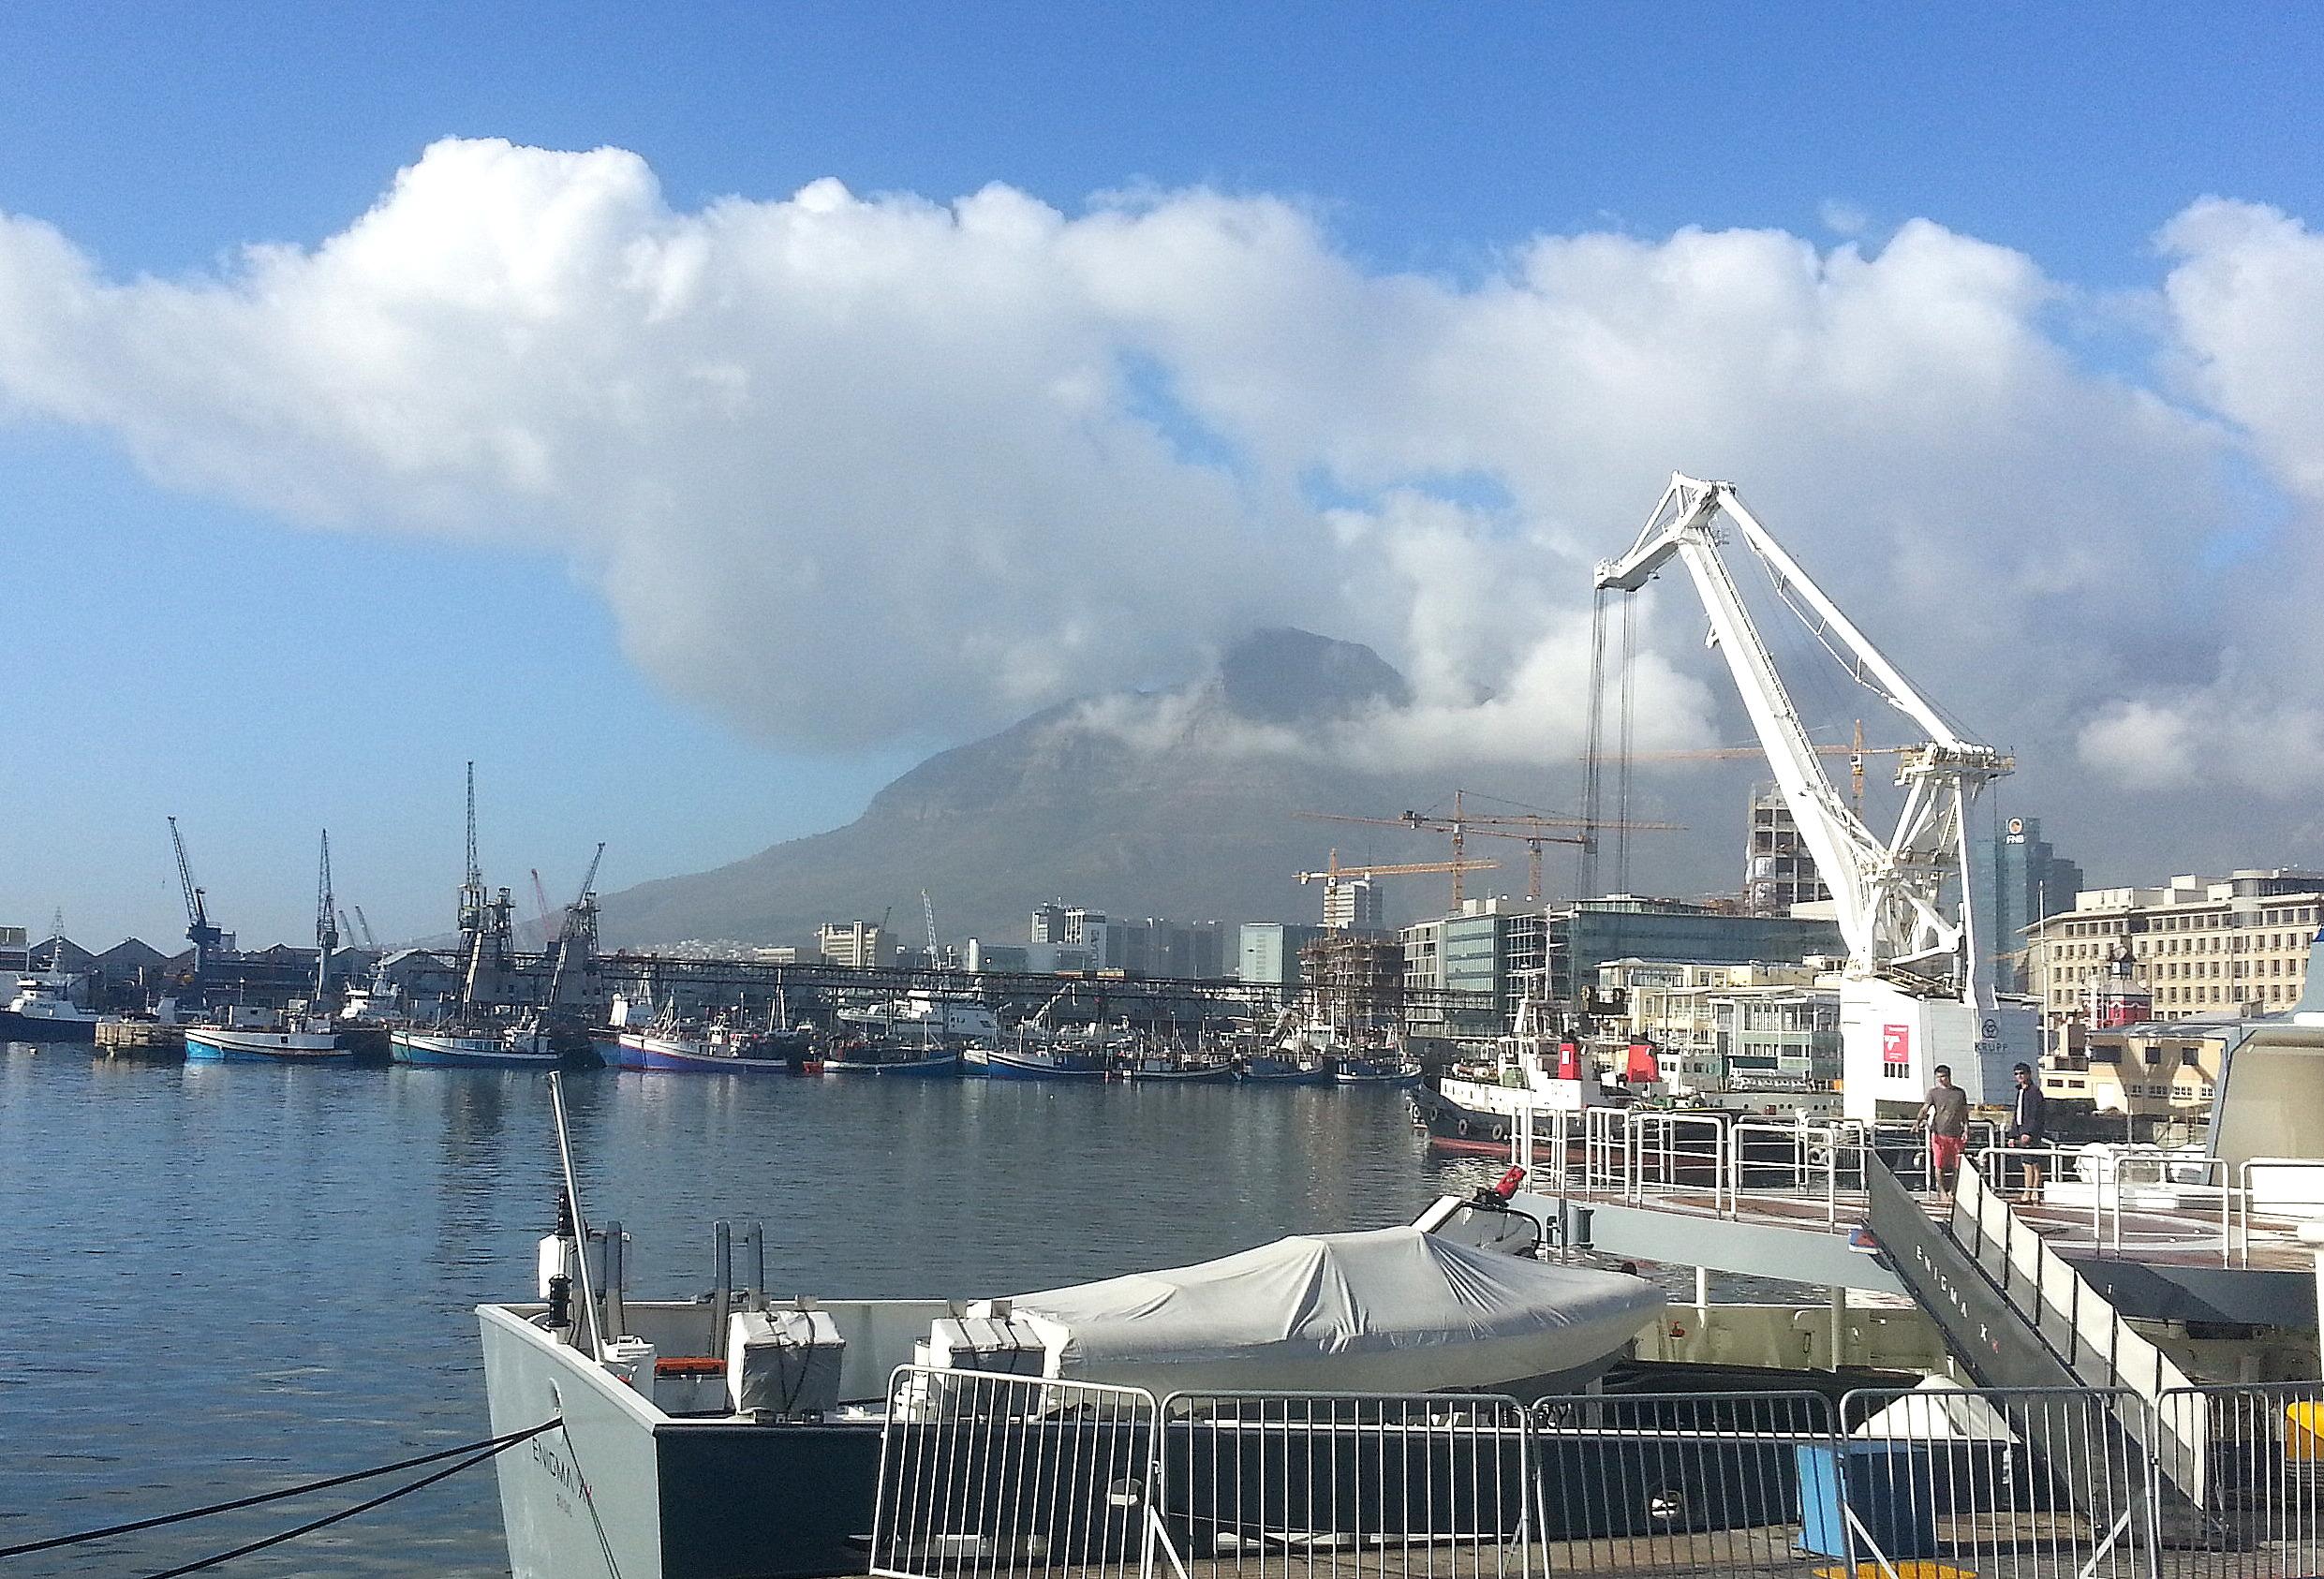 Südafrika entdecken: Kapstadt und die Kaphalbinsel suedafrika sonne safari land und leute reisebericht  20160423 093311